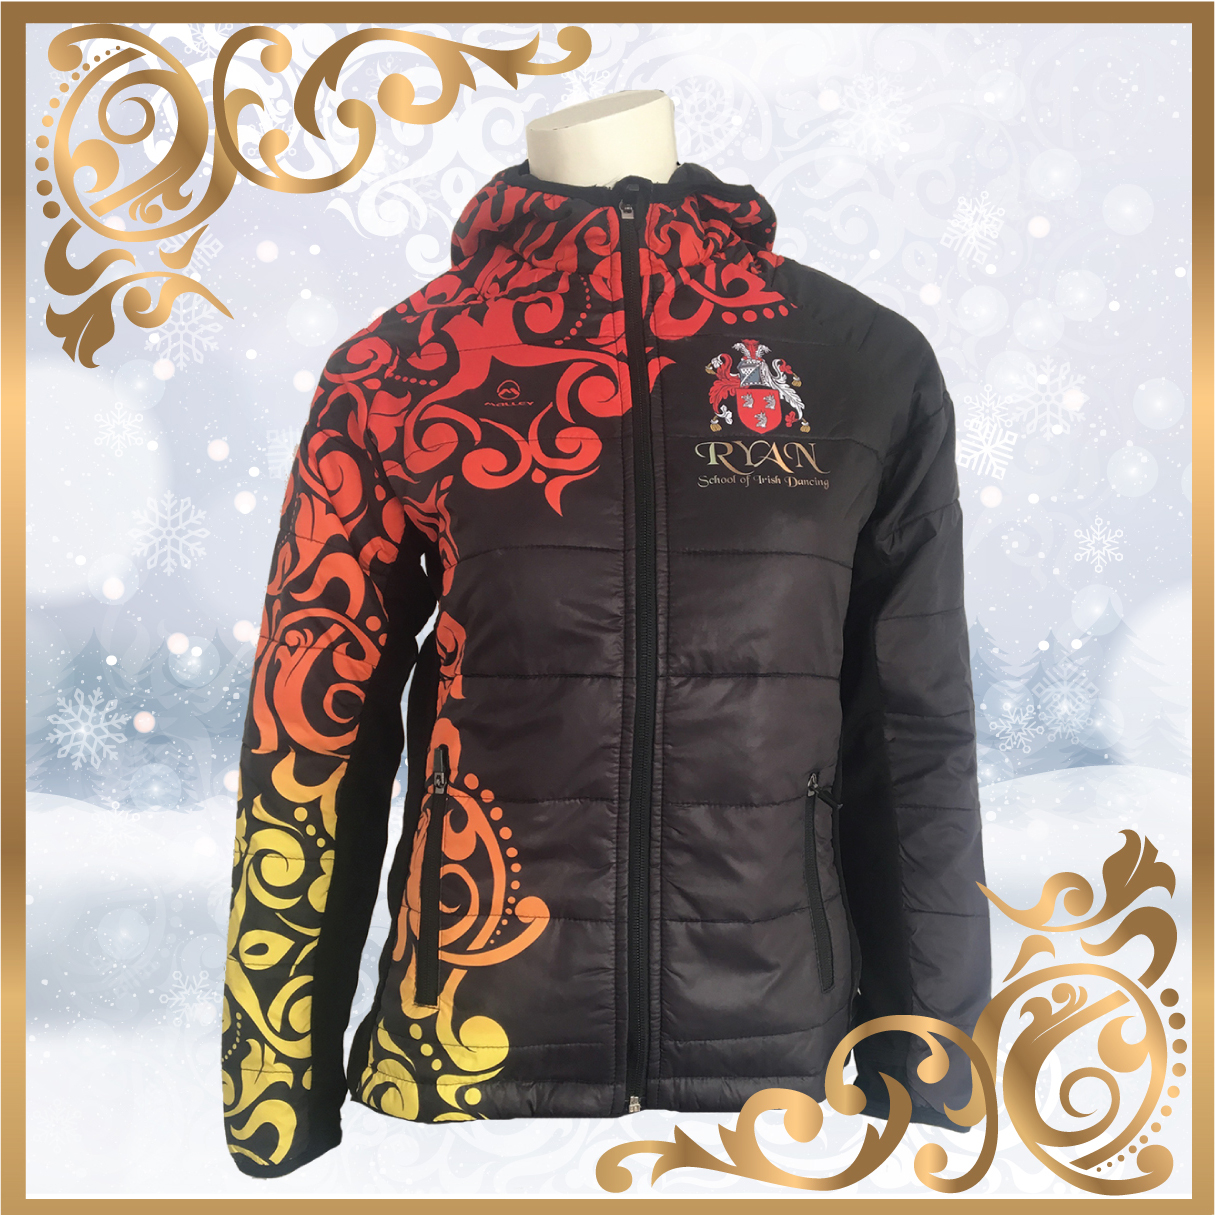 ryan_puffa_jacket_front.jpg